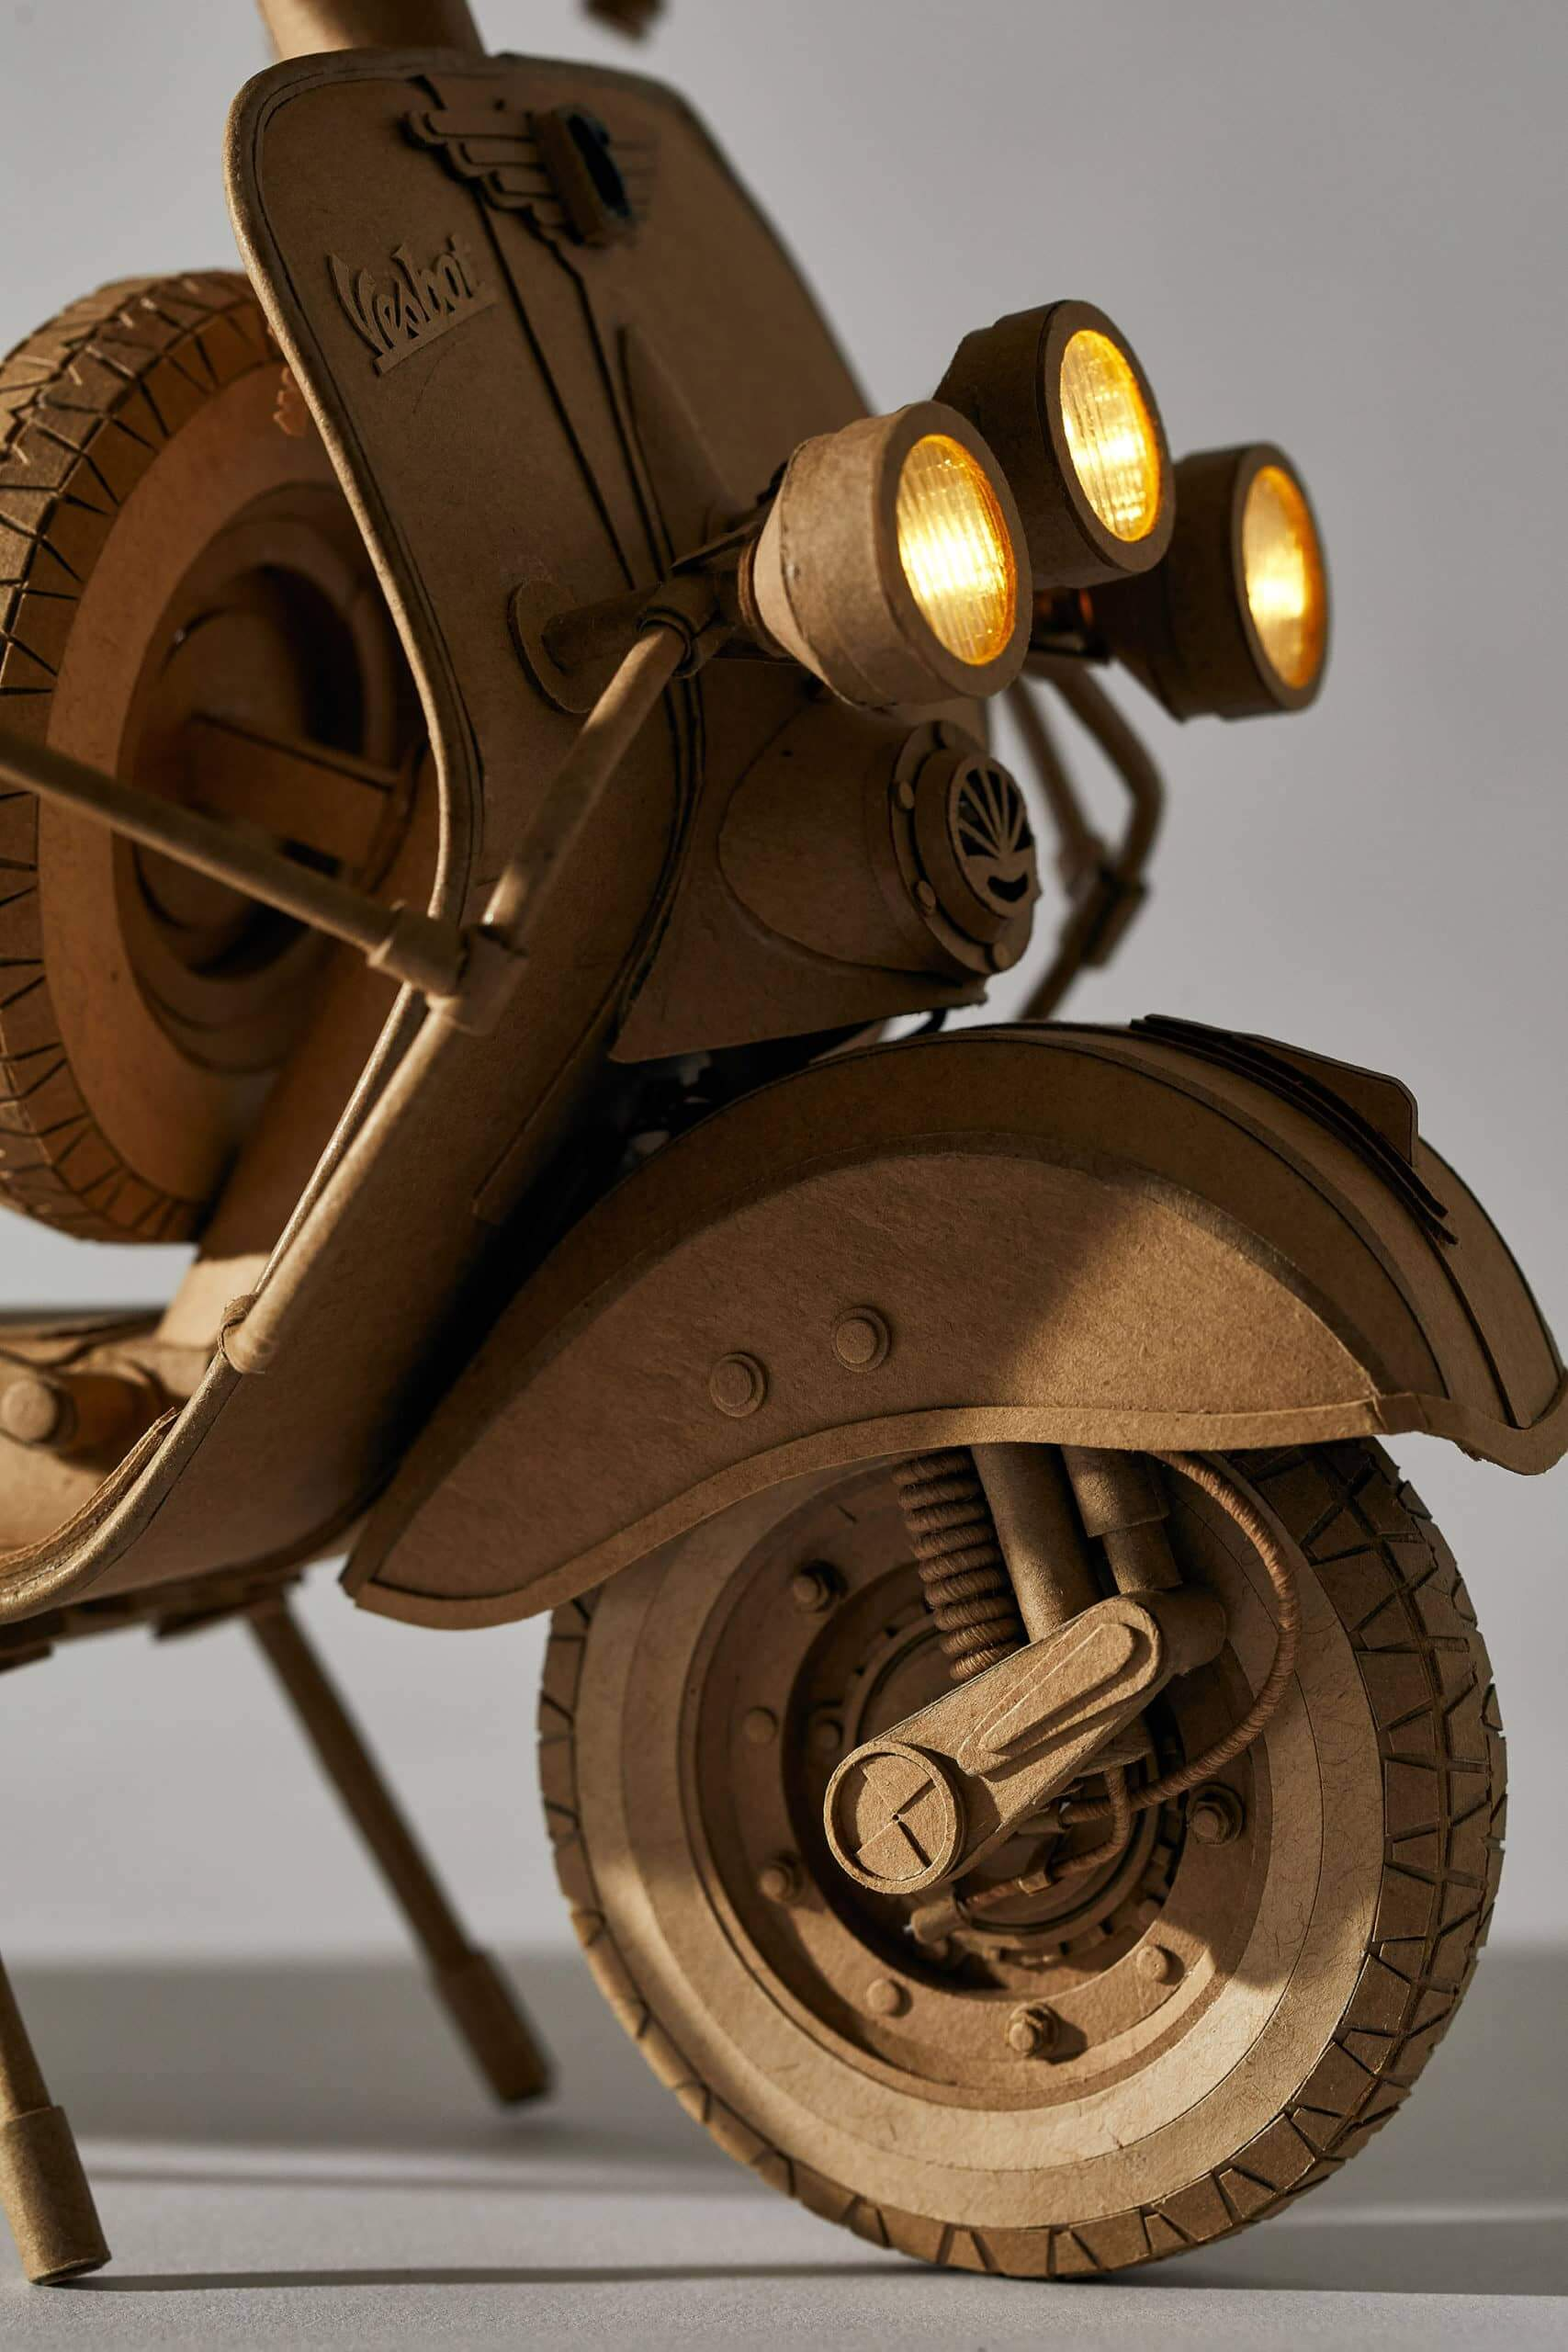 detalle de moto vespa hecha en cartón por greg olijnyk